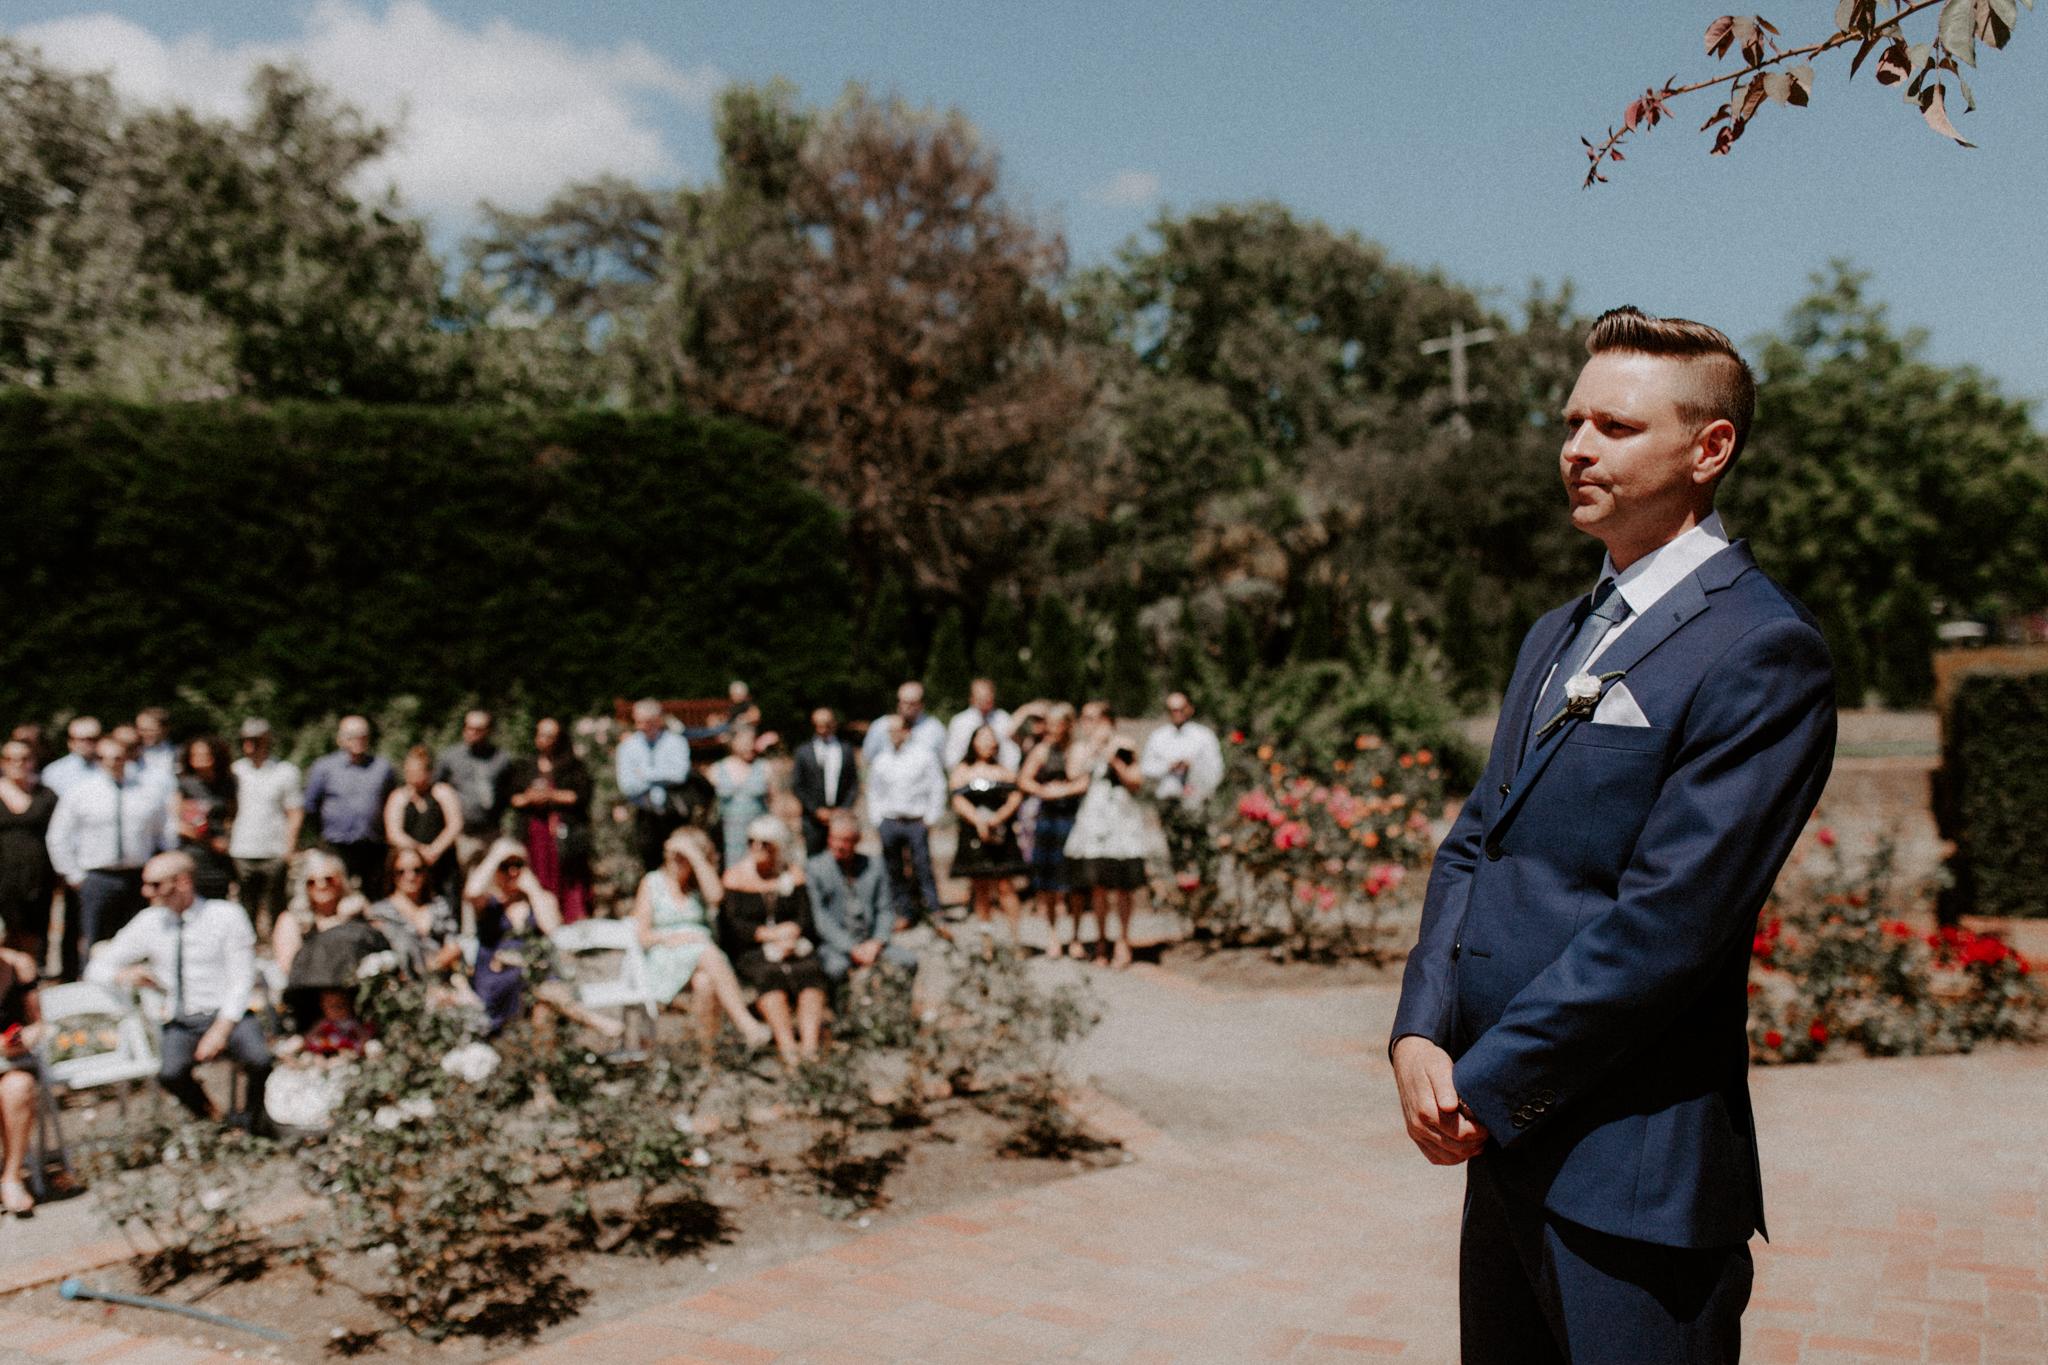 St-Kilda-Garden-Wedding-Emotions-and-Math-Photograph-050.jpg